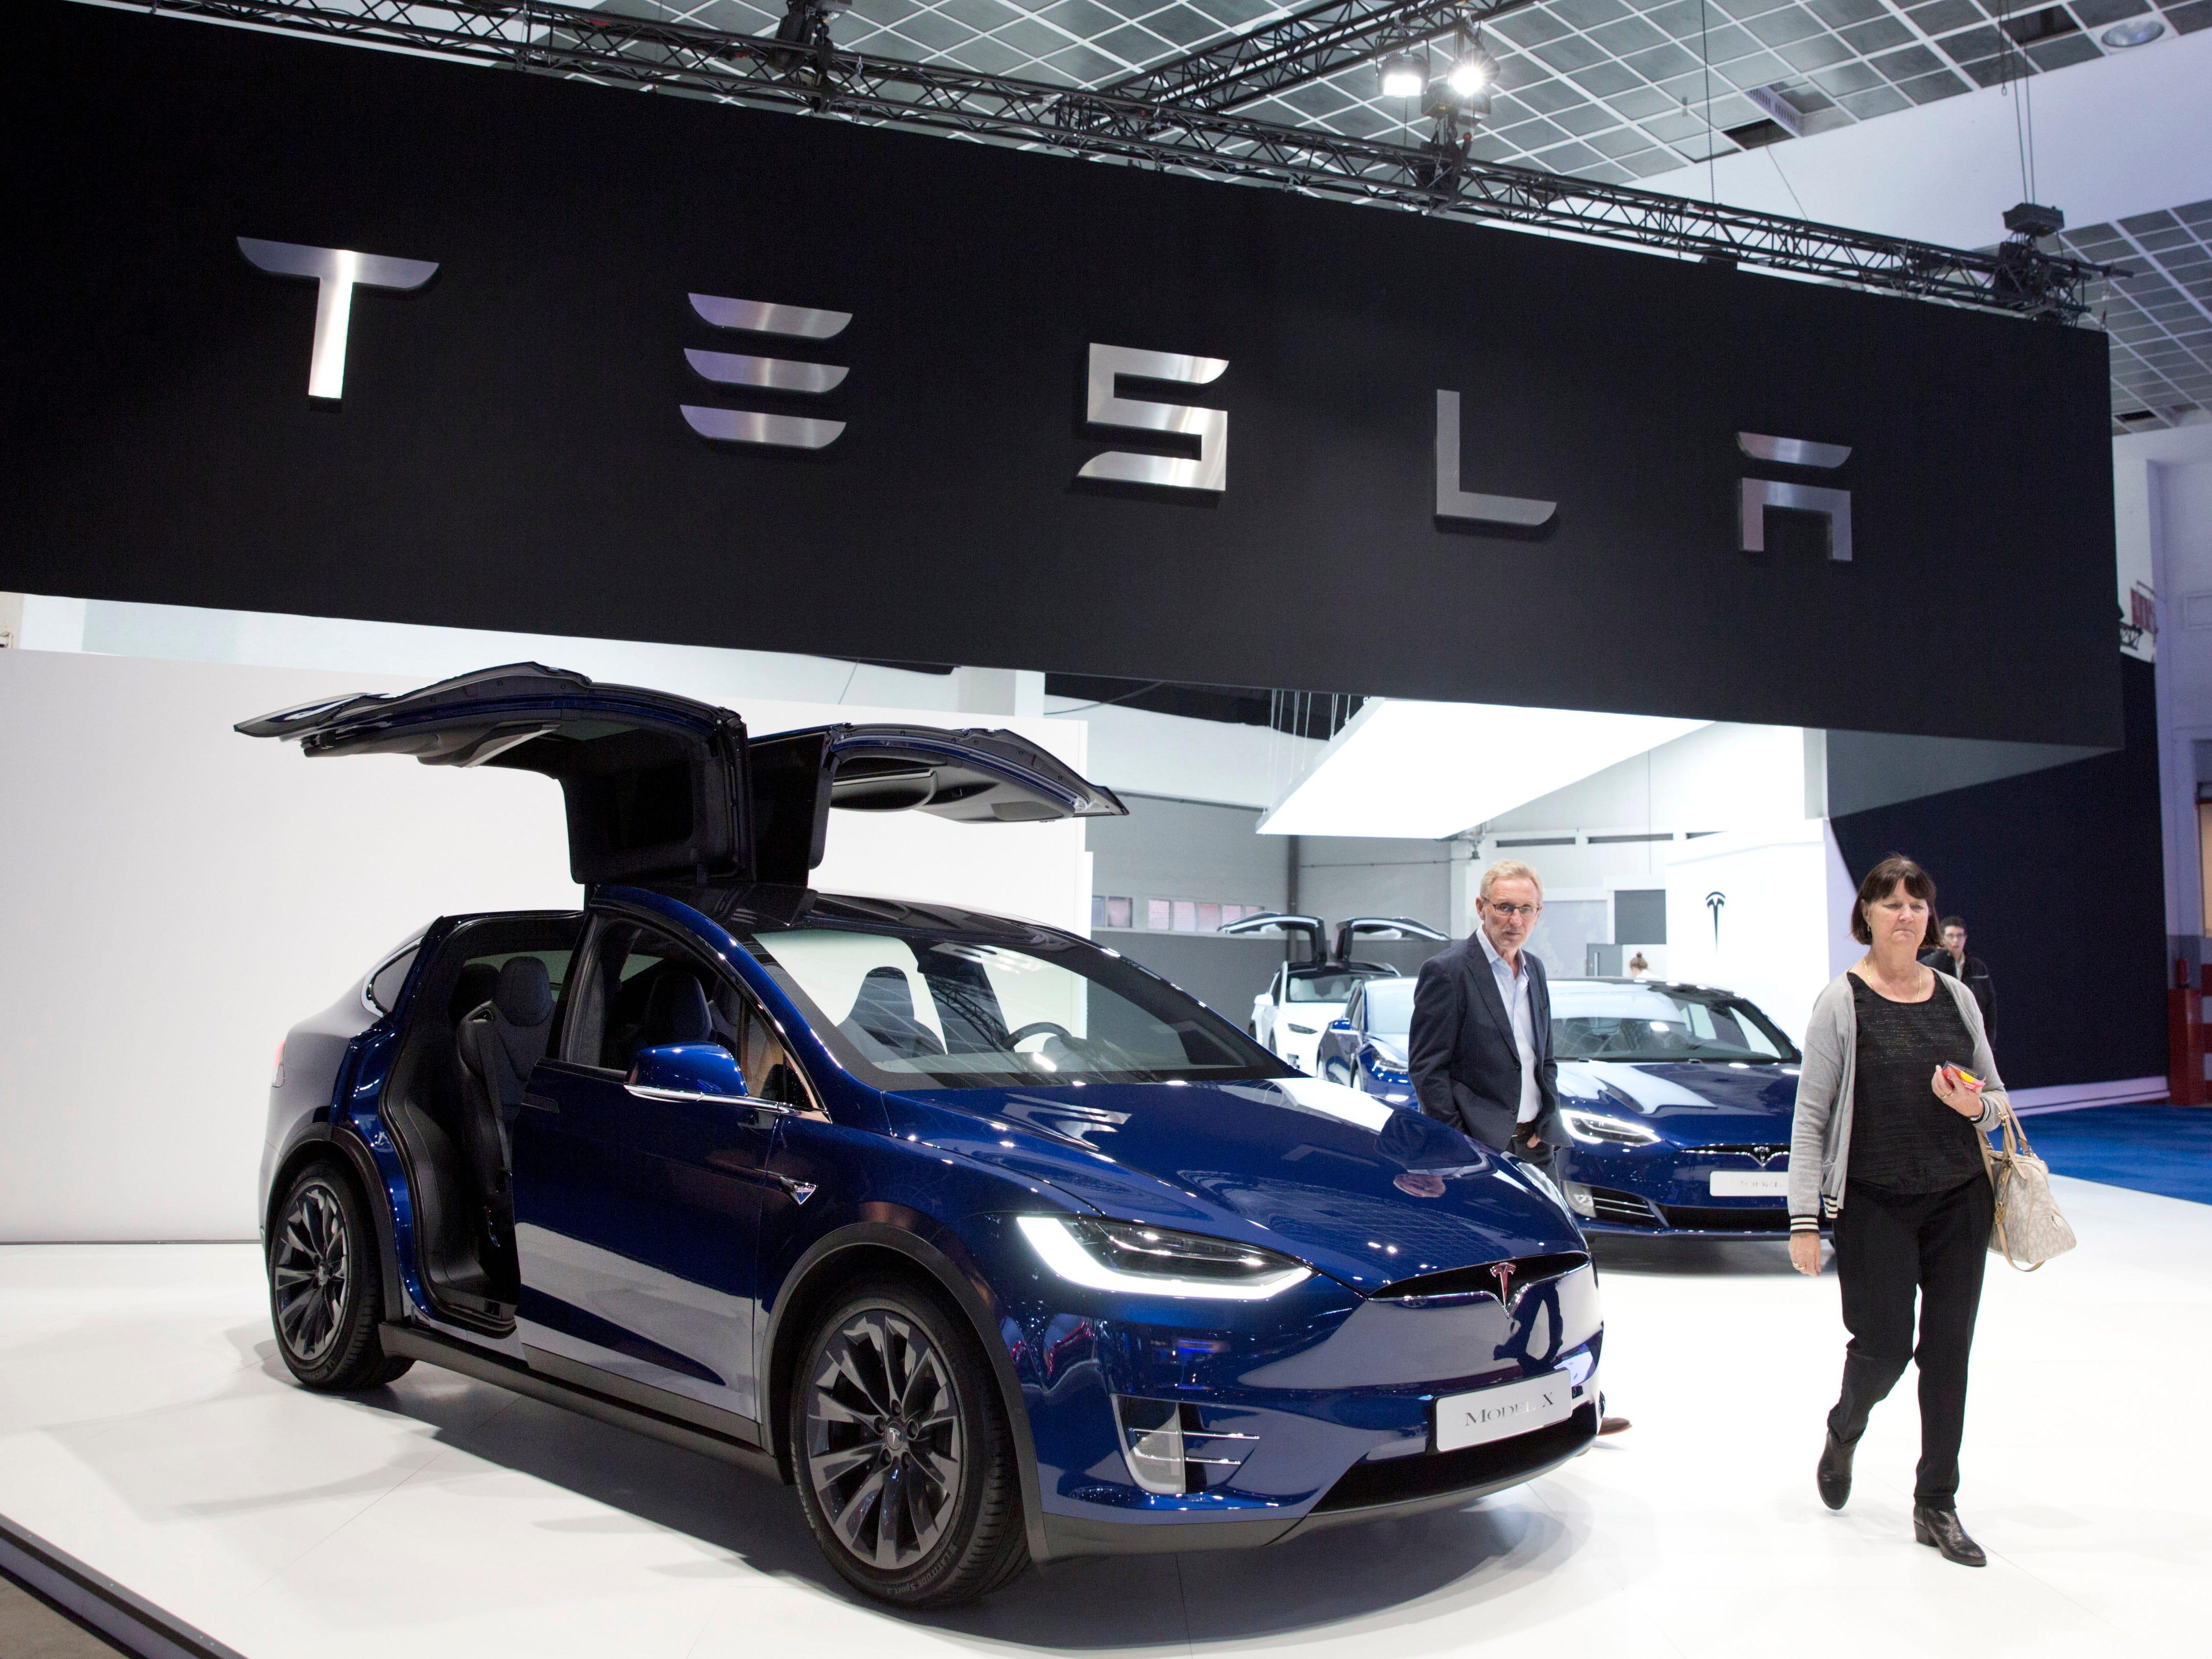 A couple walk next to the new Tesla Model X.